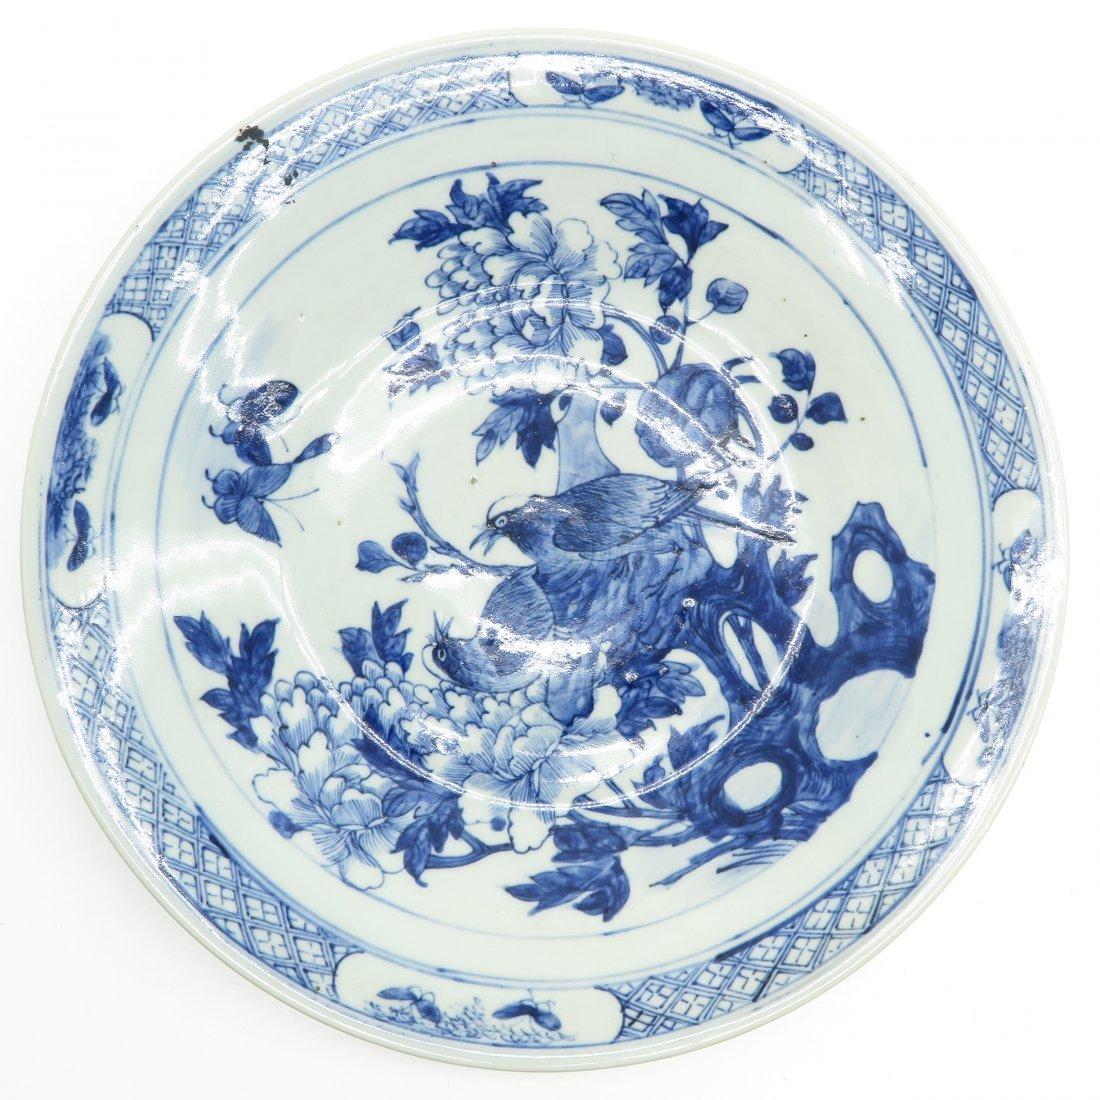 China Porcelain Plate Circa 1900